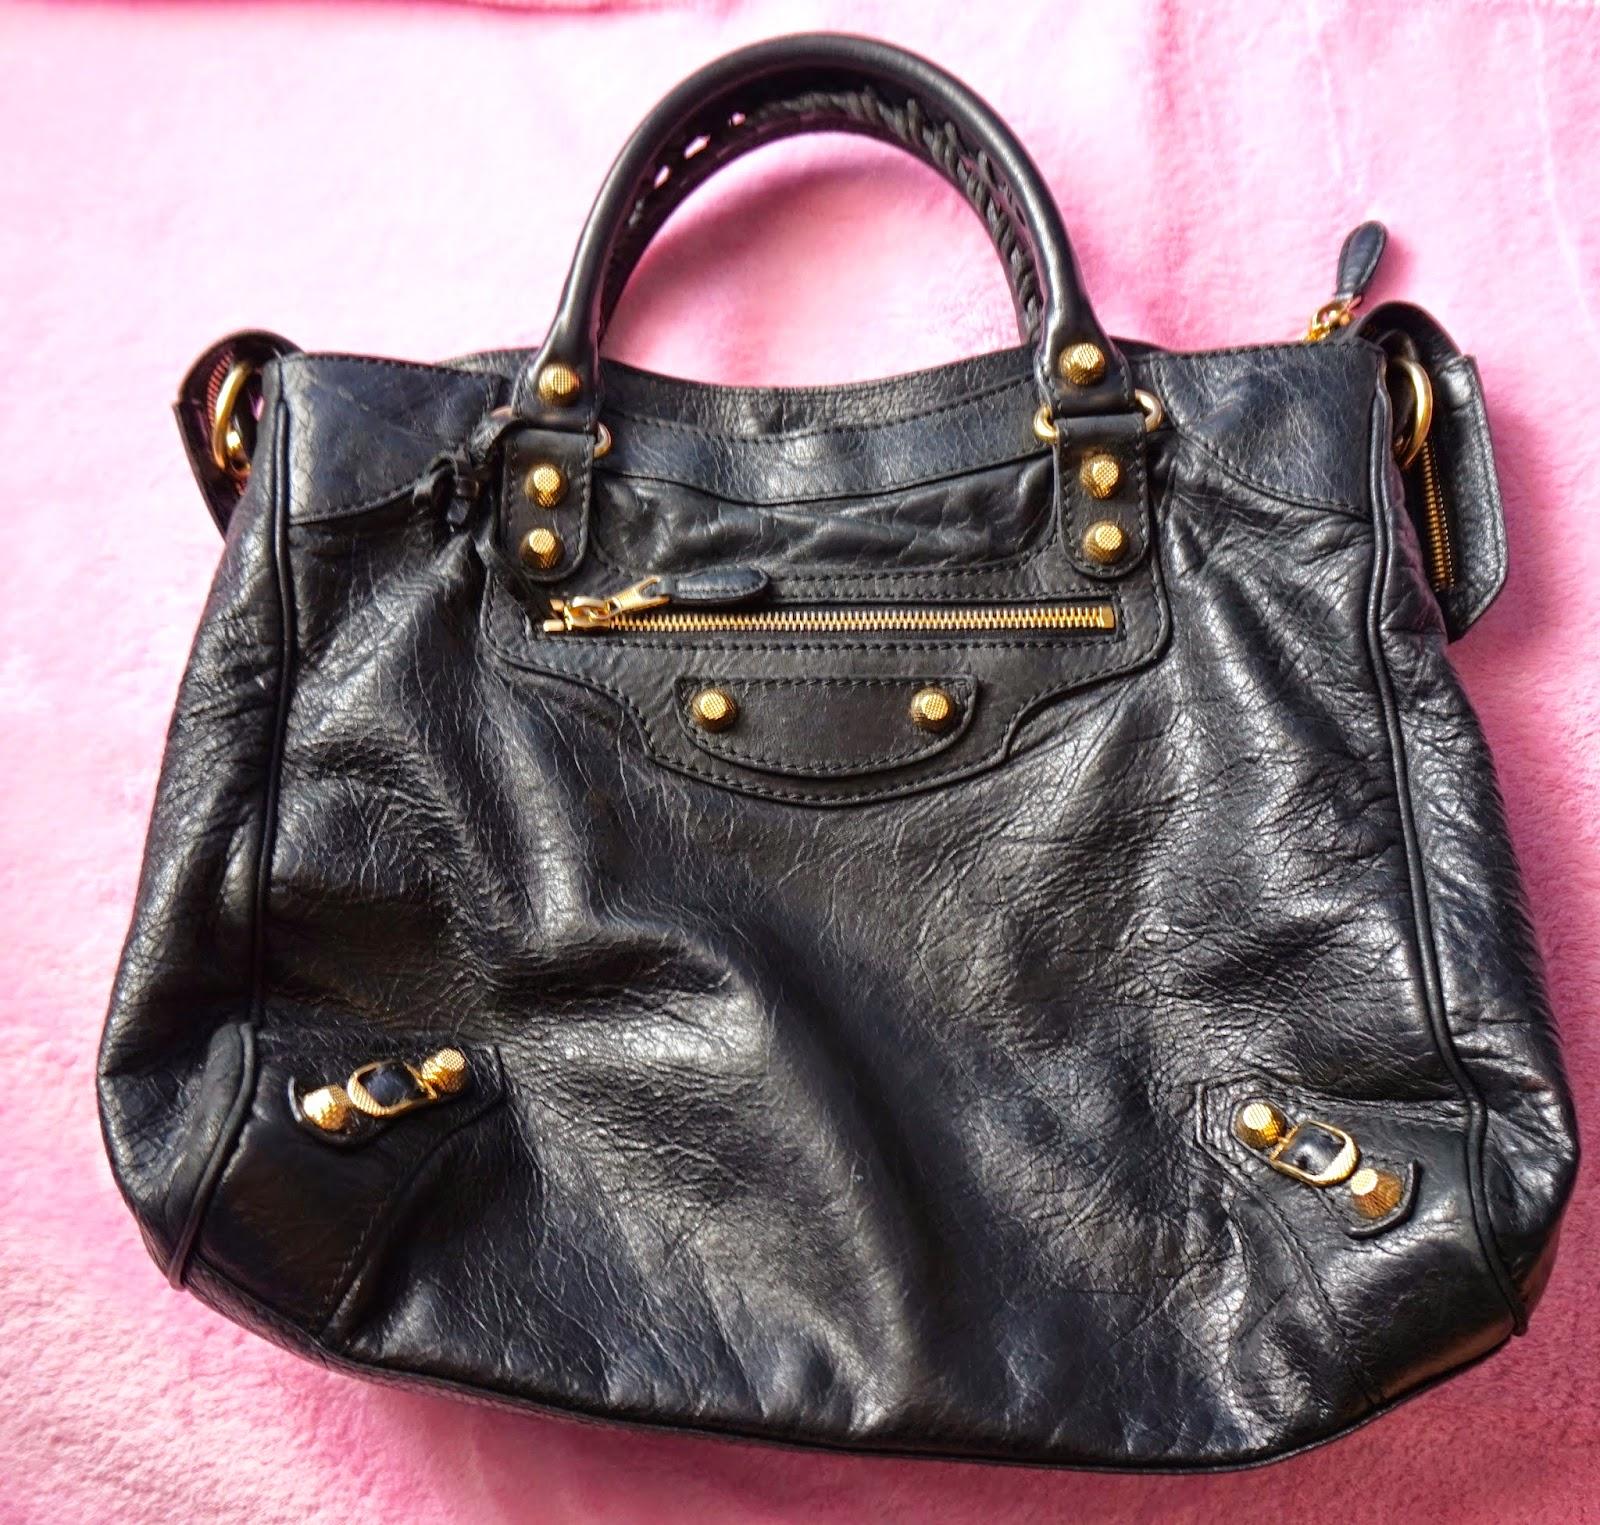 Bag Review Balenciaga Giant 12 Gold Velo In Black Spot A Fake The Beauty Junkee